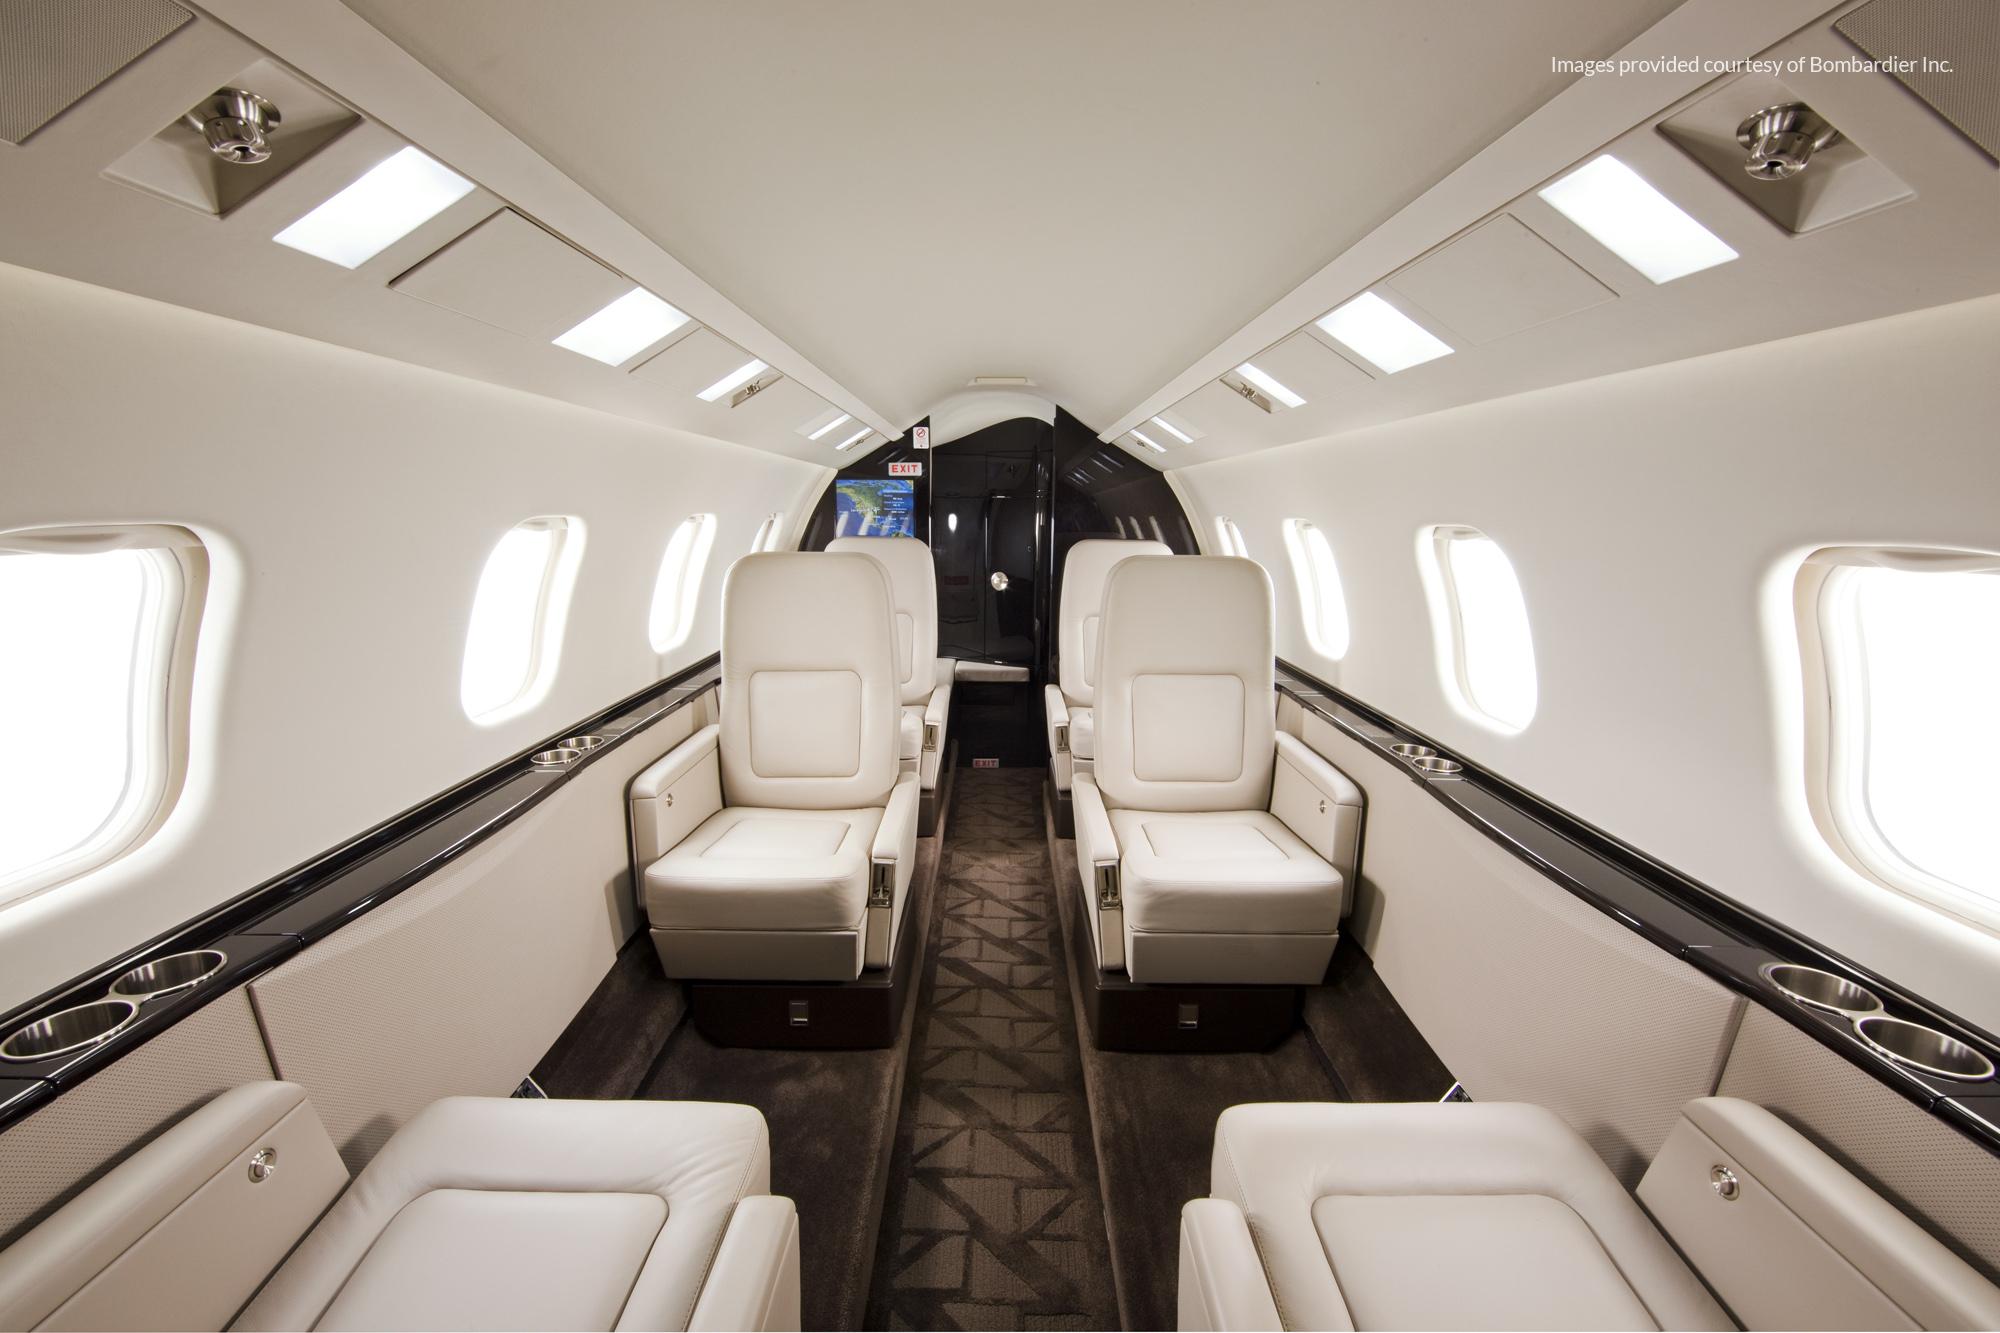 Lear 60 interior.jpg